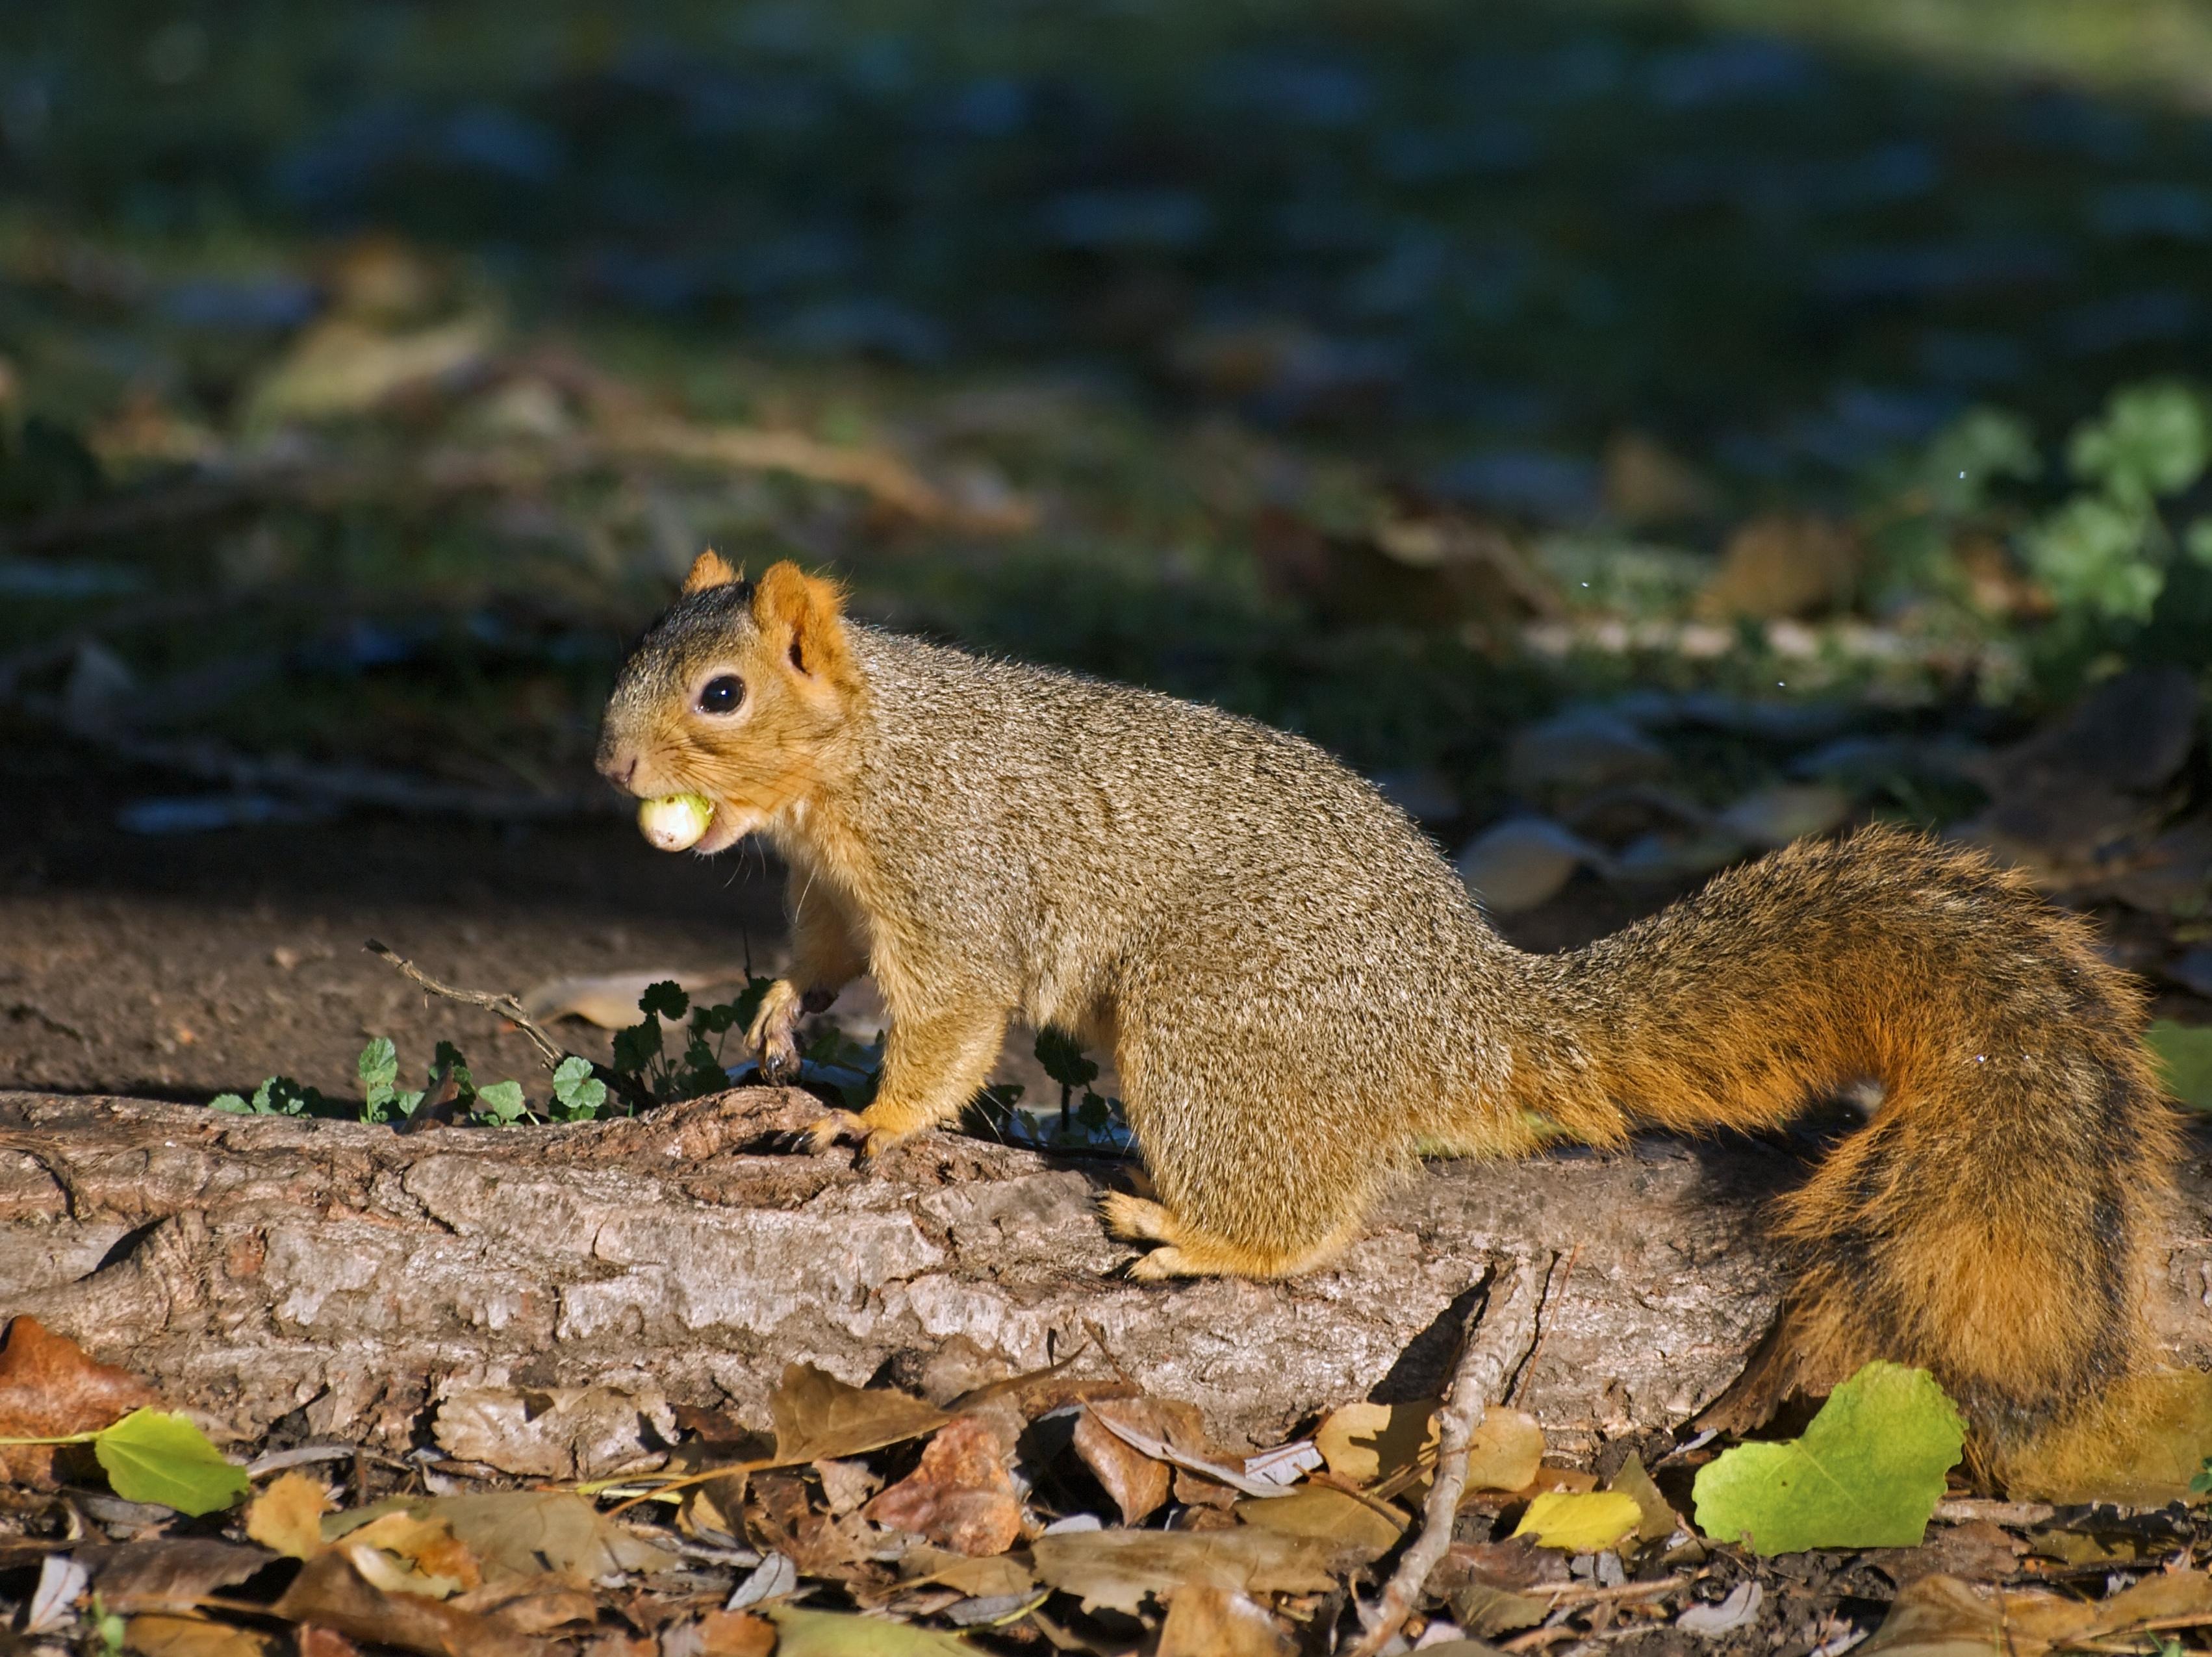 Short essay on squirrel